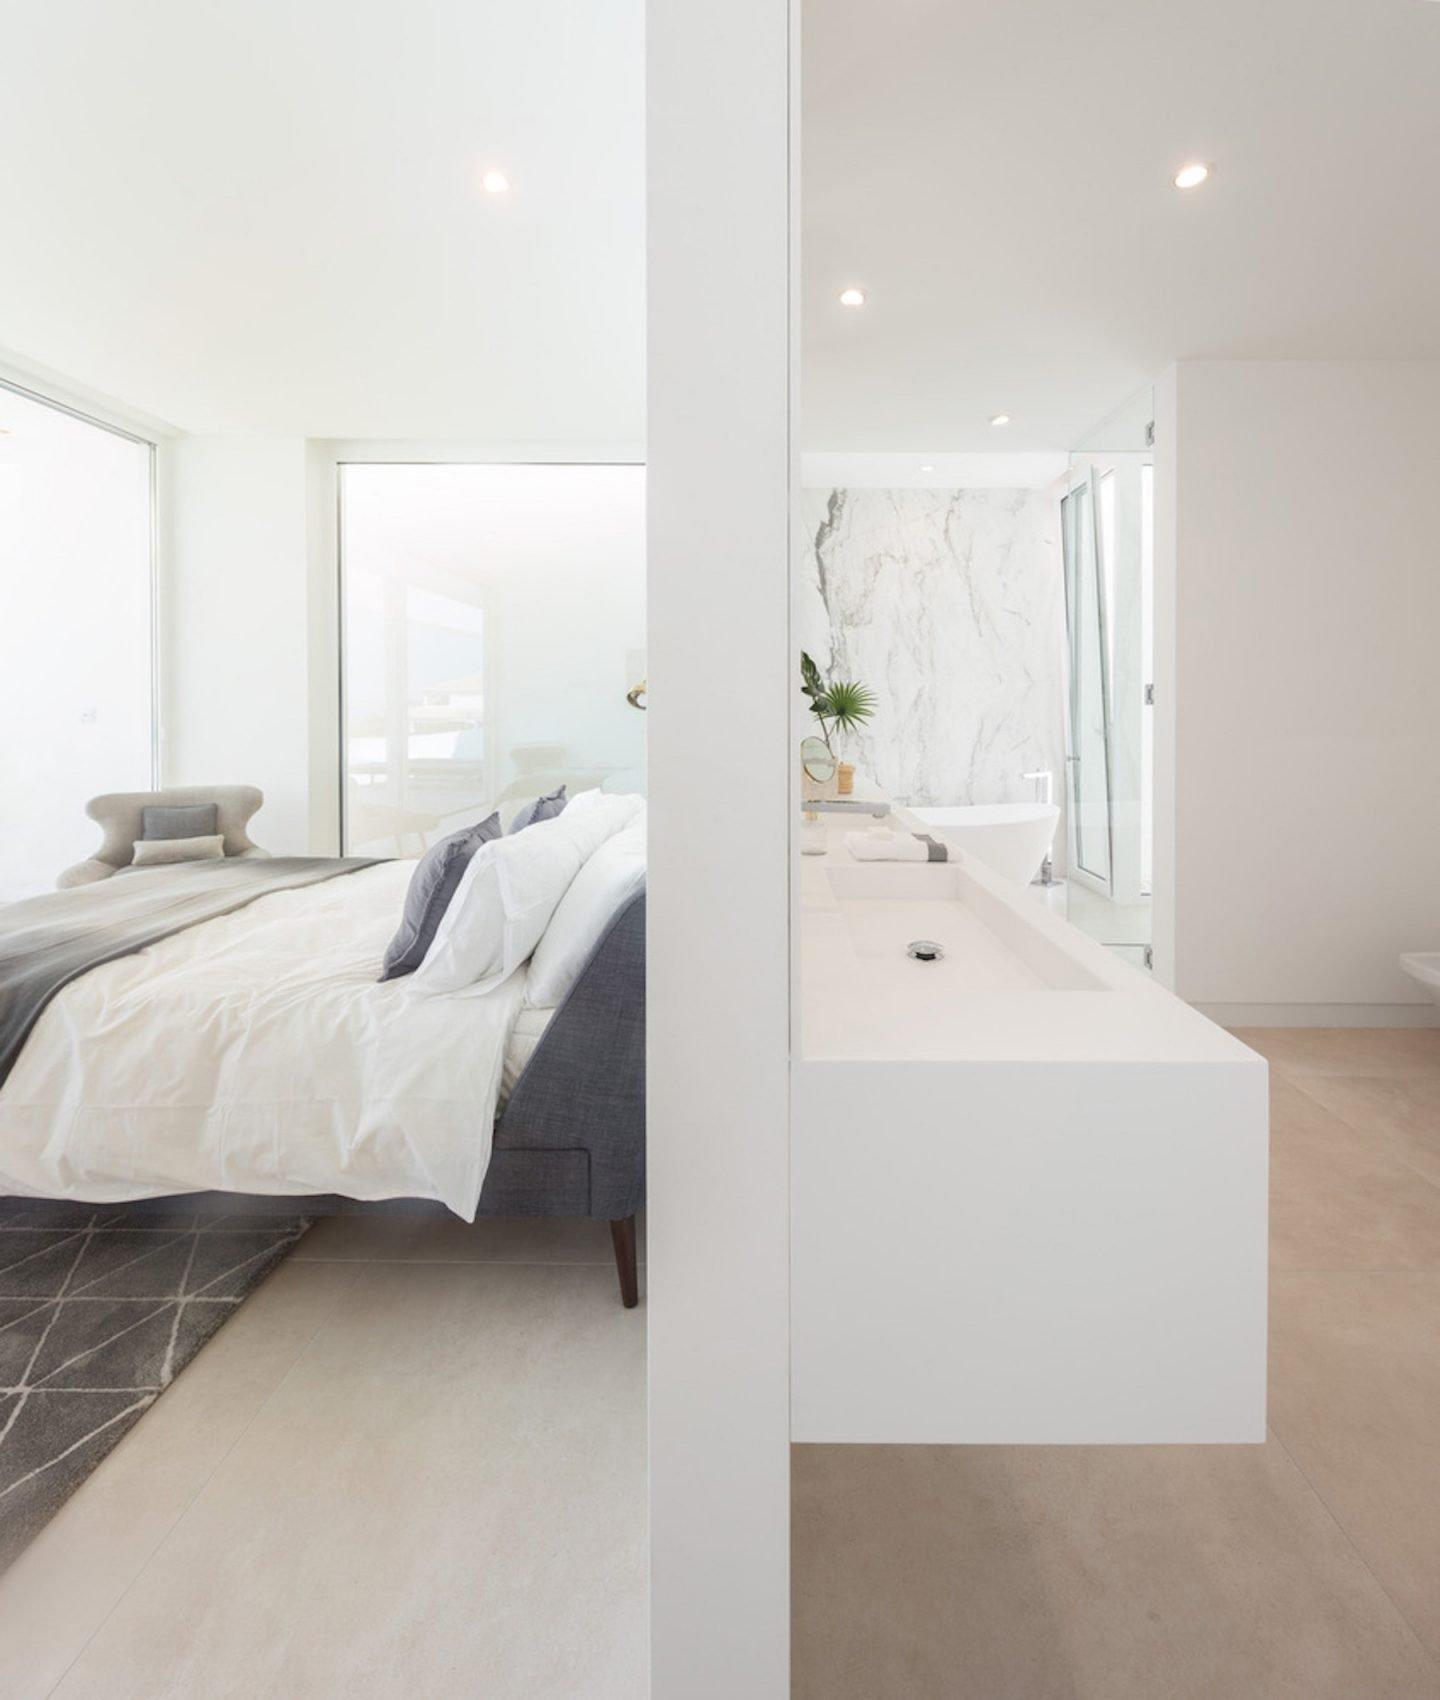 iGNANT-Architecture-Mário-Martins-Atelier-Casa-Carrara-13